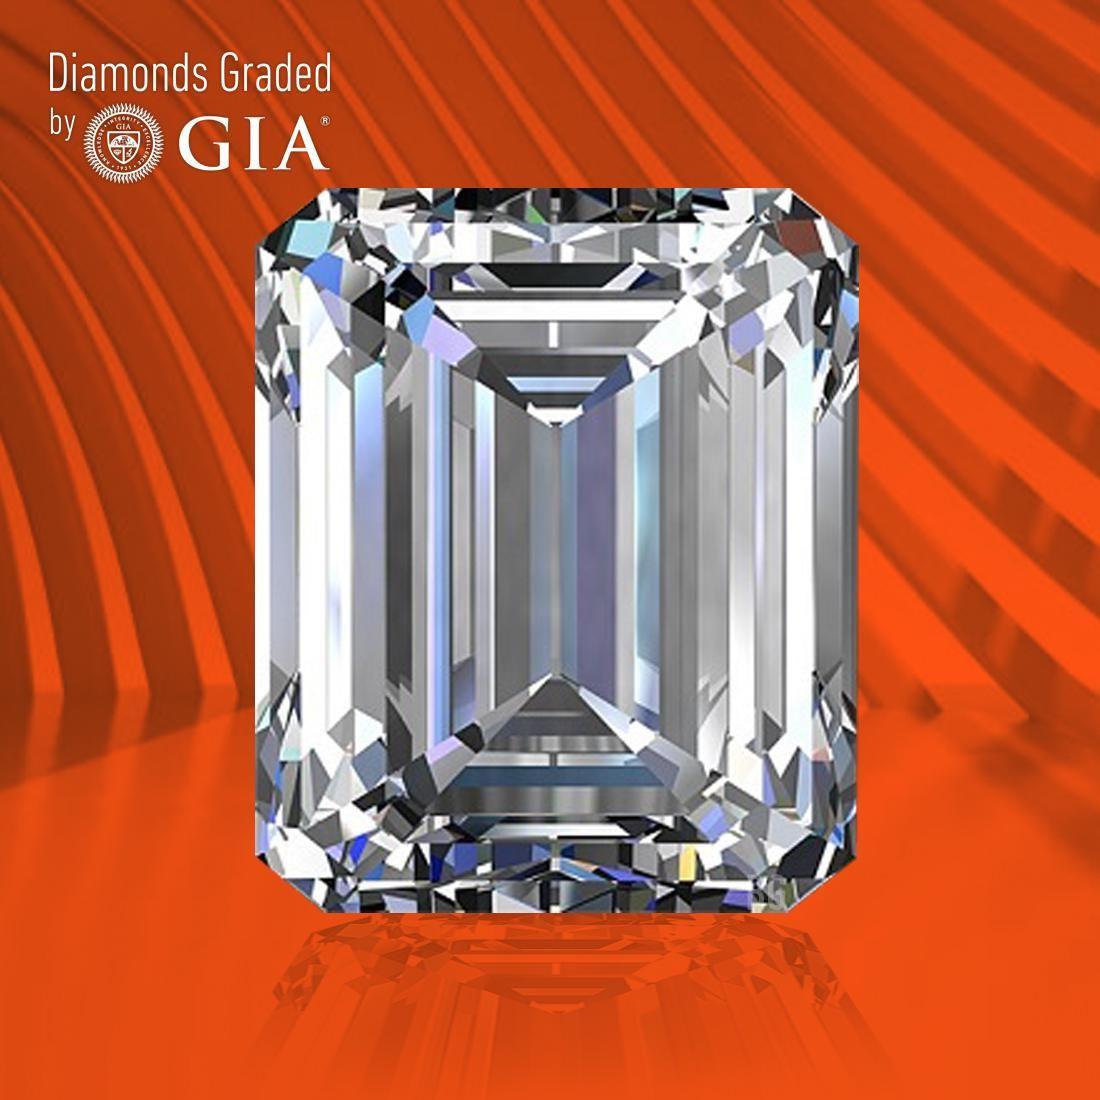 0.50 ct, Color D/VVS2, Emerald cut GIA Graded Diamond